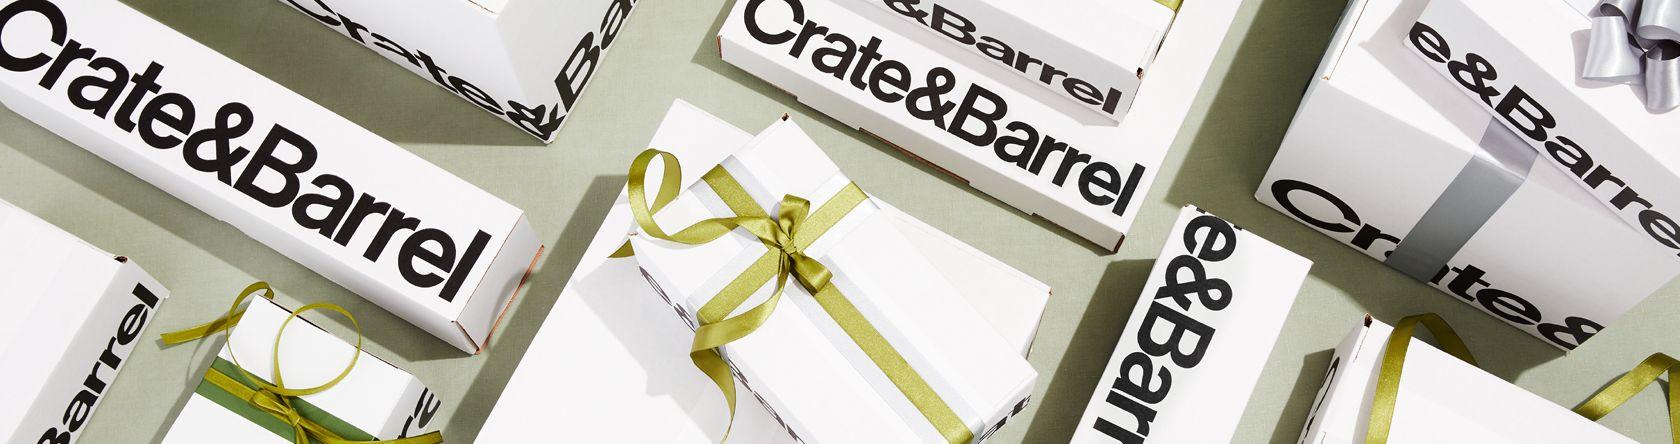 Gift Registry Benefits Crate And Barrel